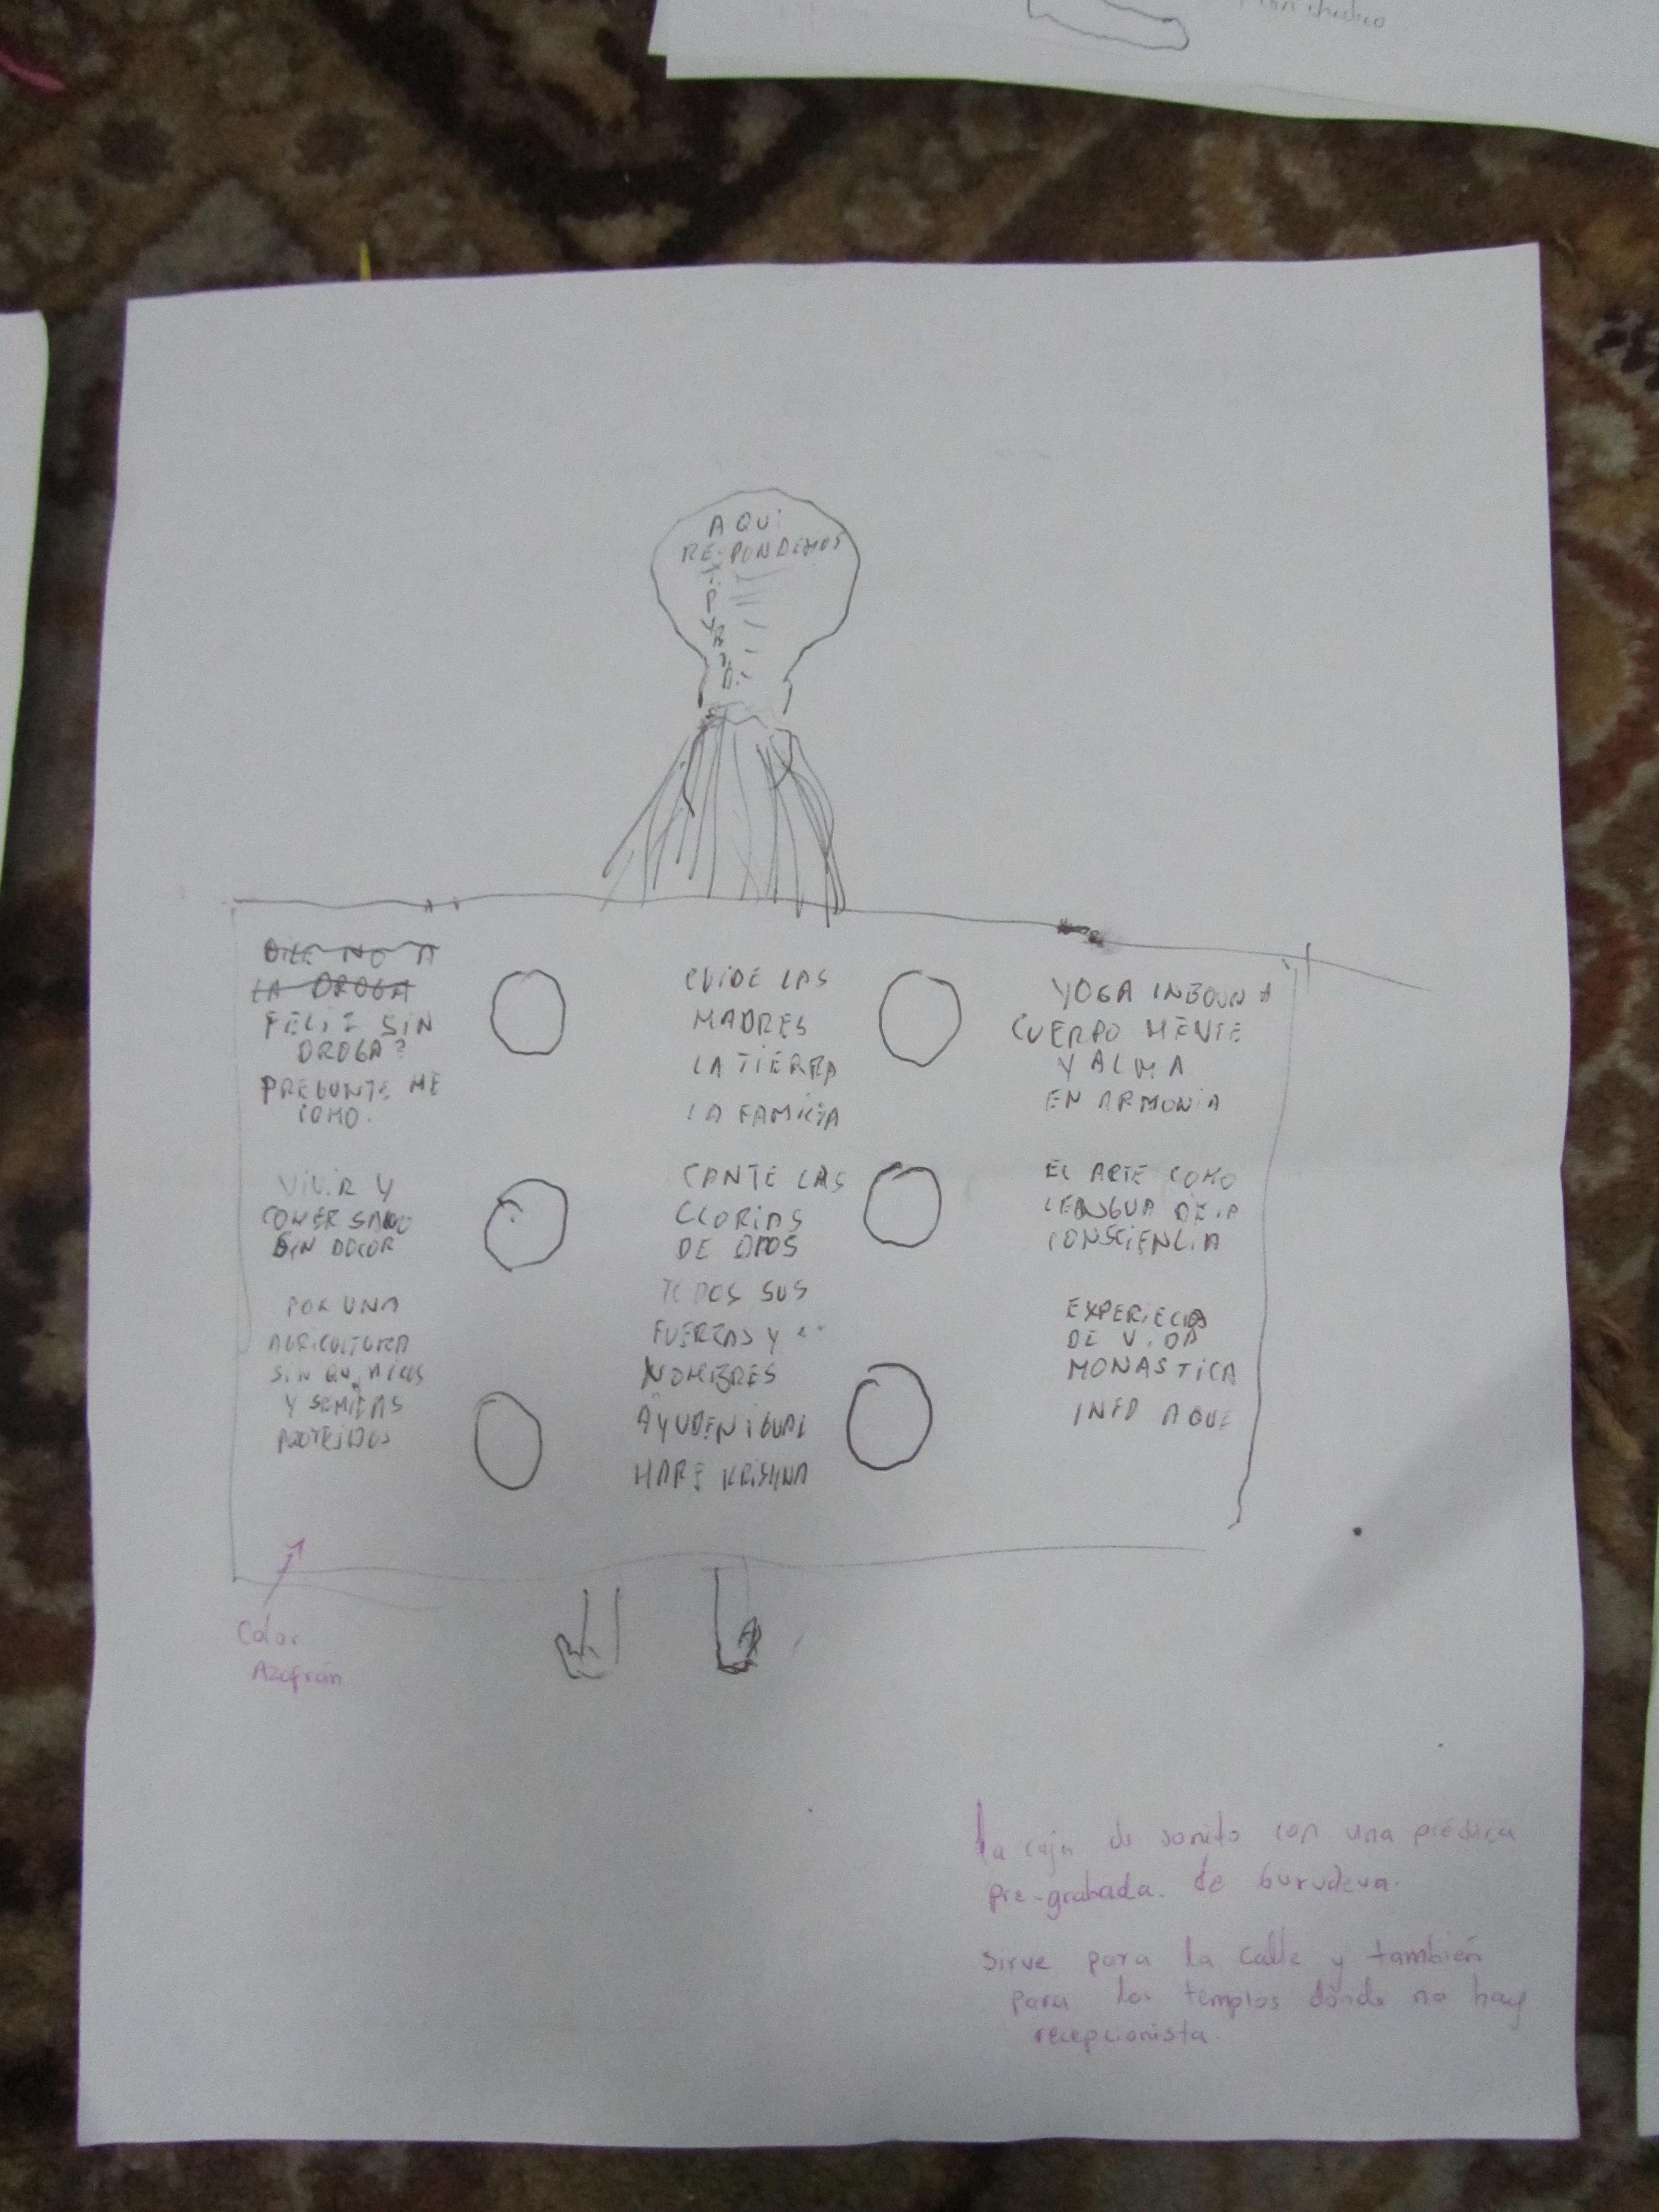 http://gurumaharaj.net/hombrepancarta/hombrepancarta2.JPG